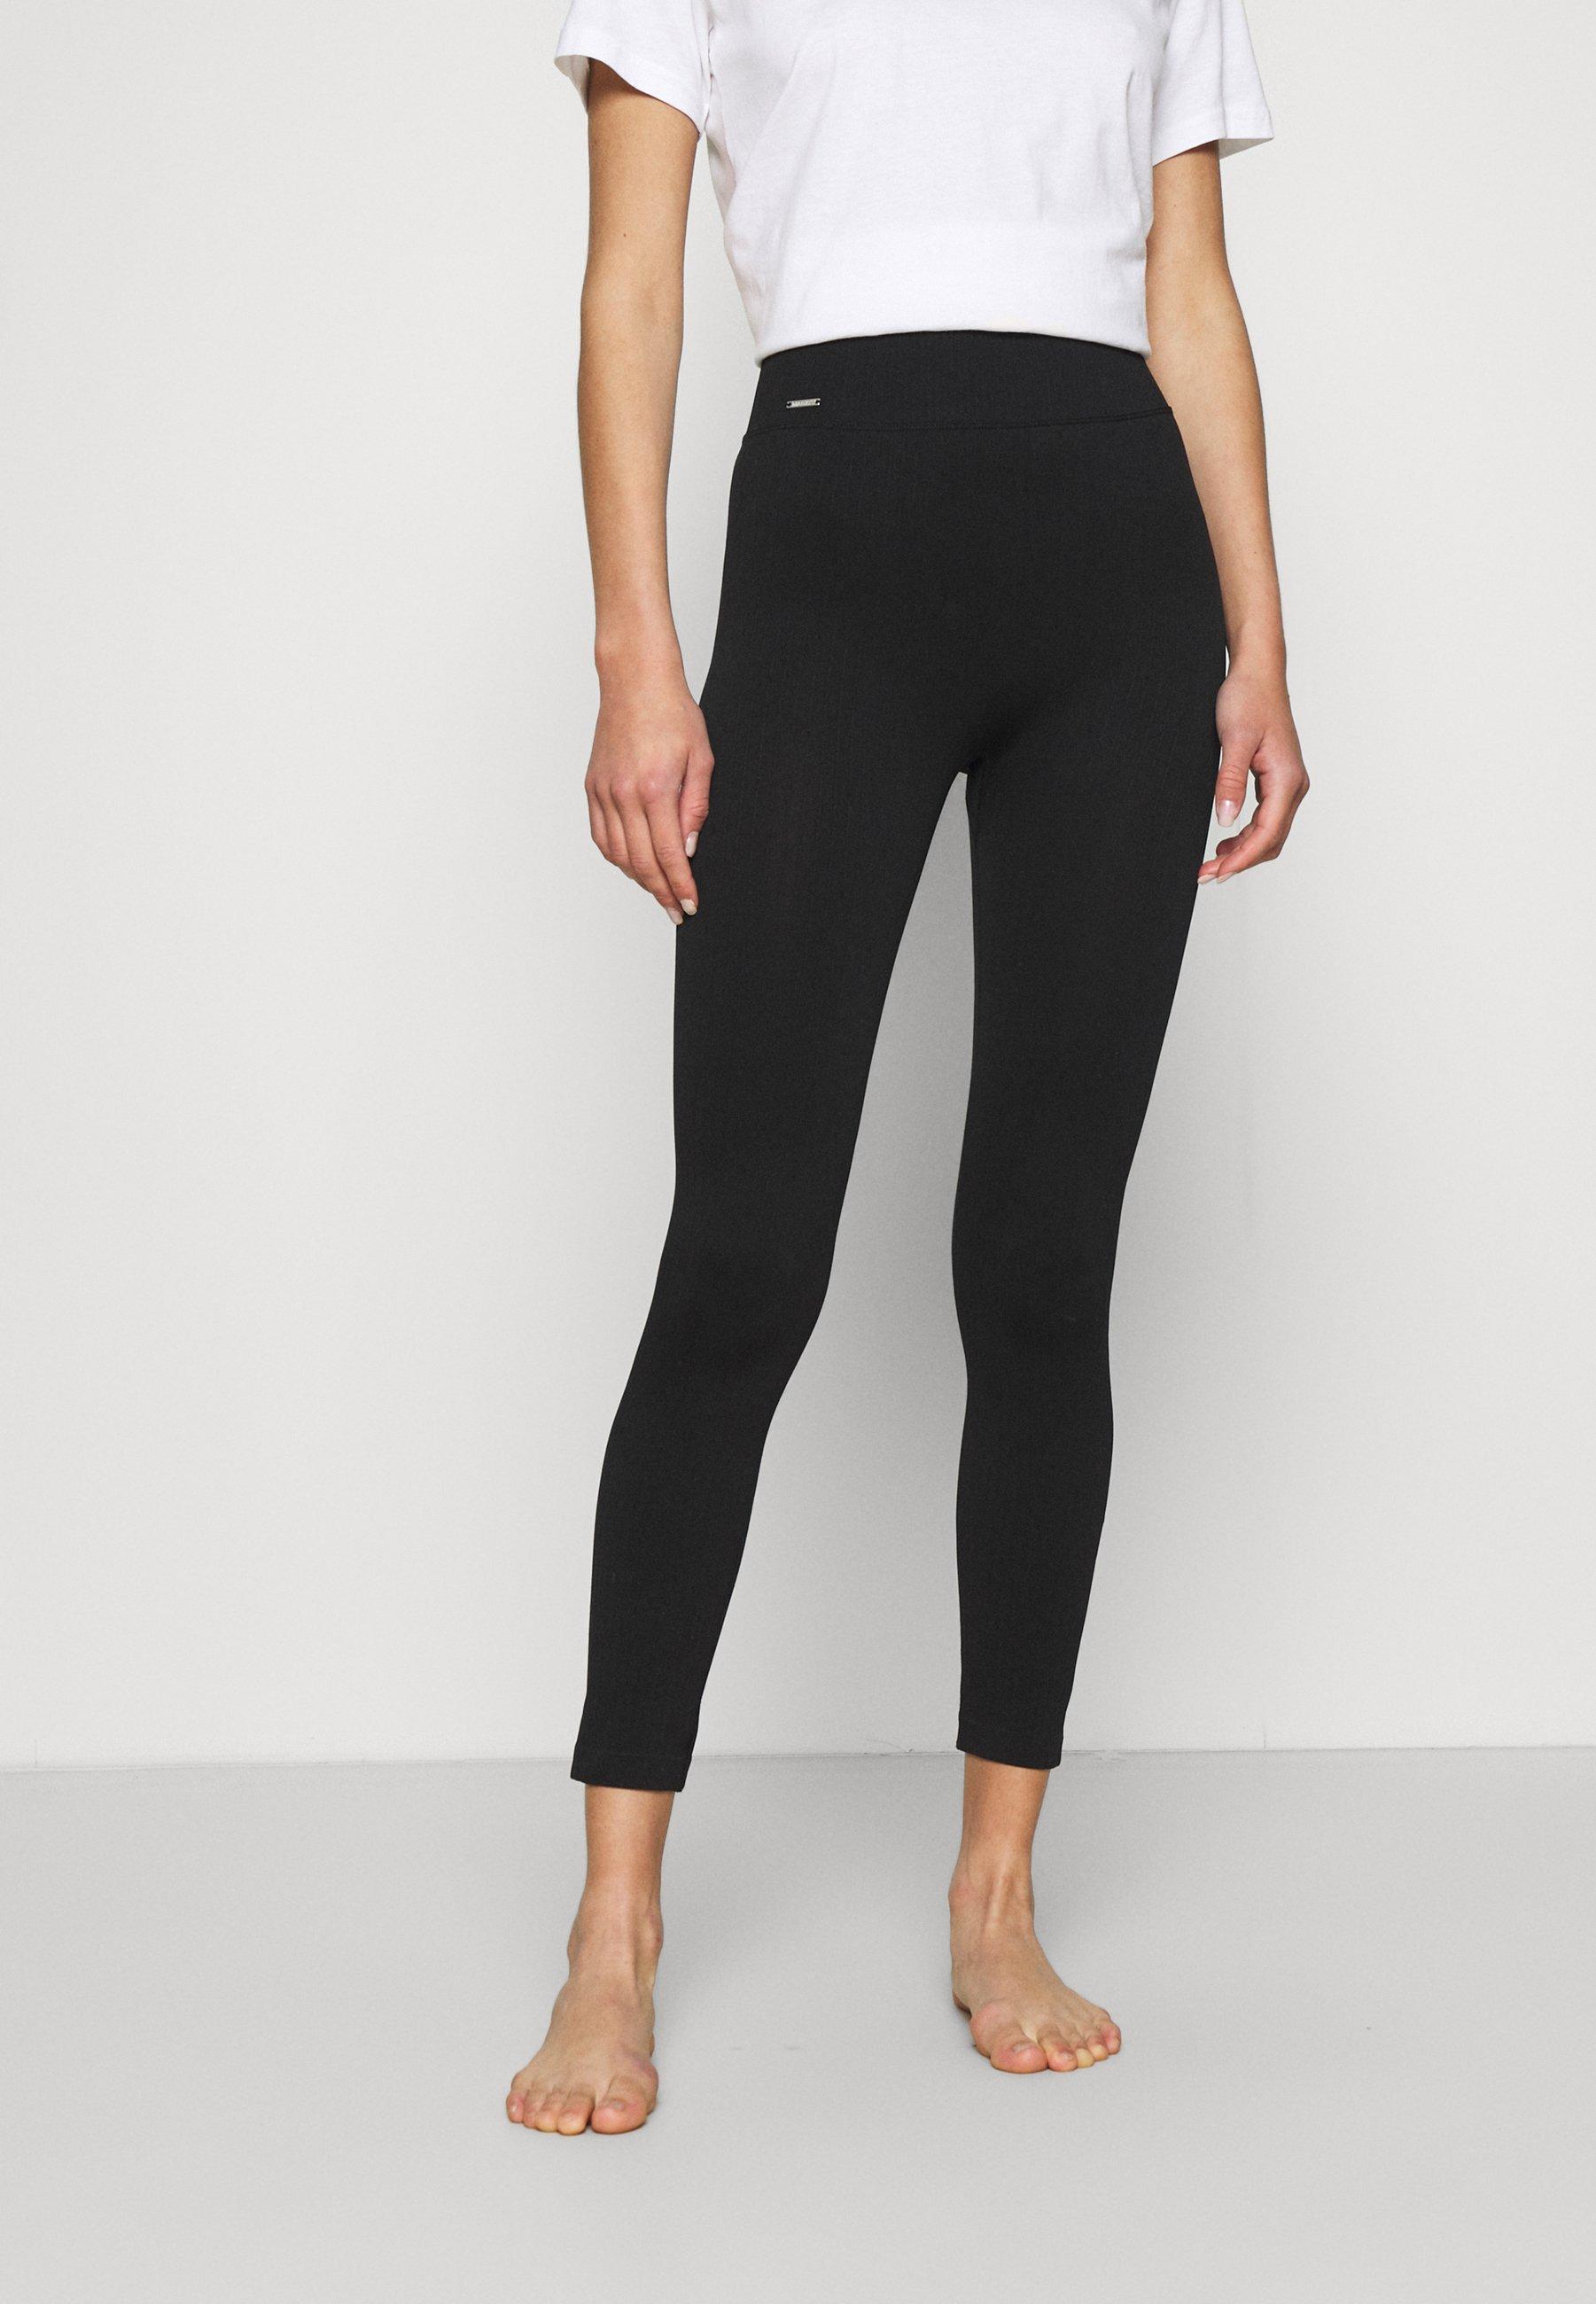 Damen LOUNGE PANTS - Nachtwäsche Hose